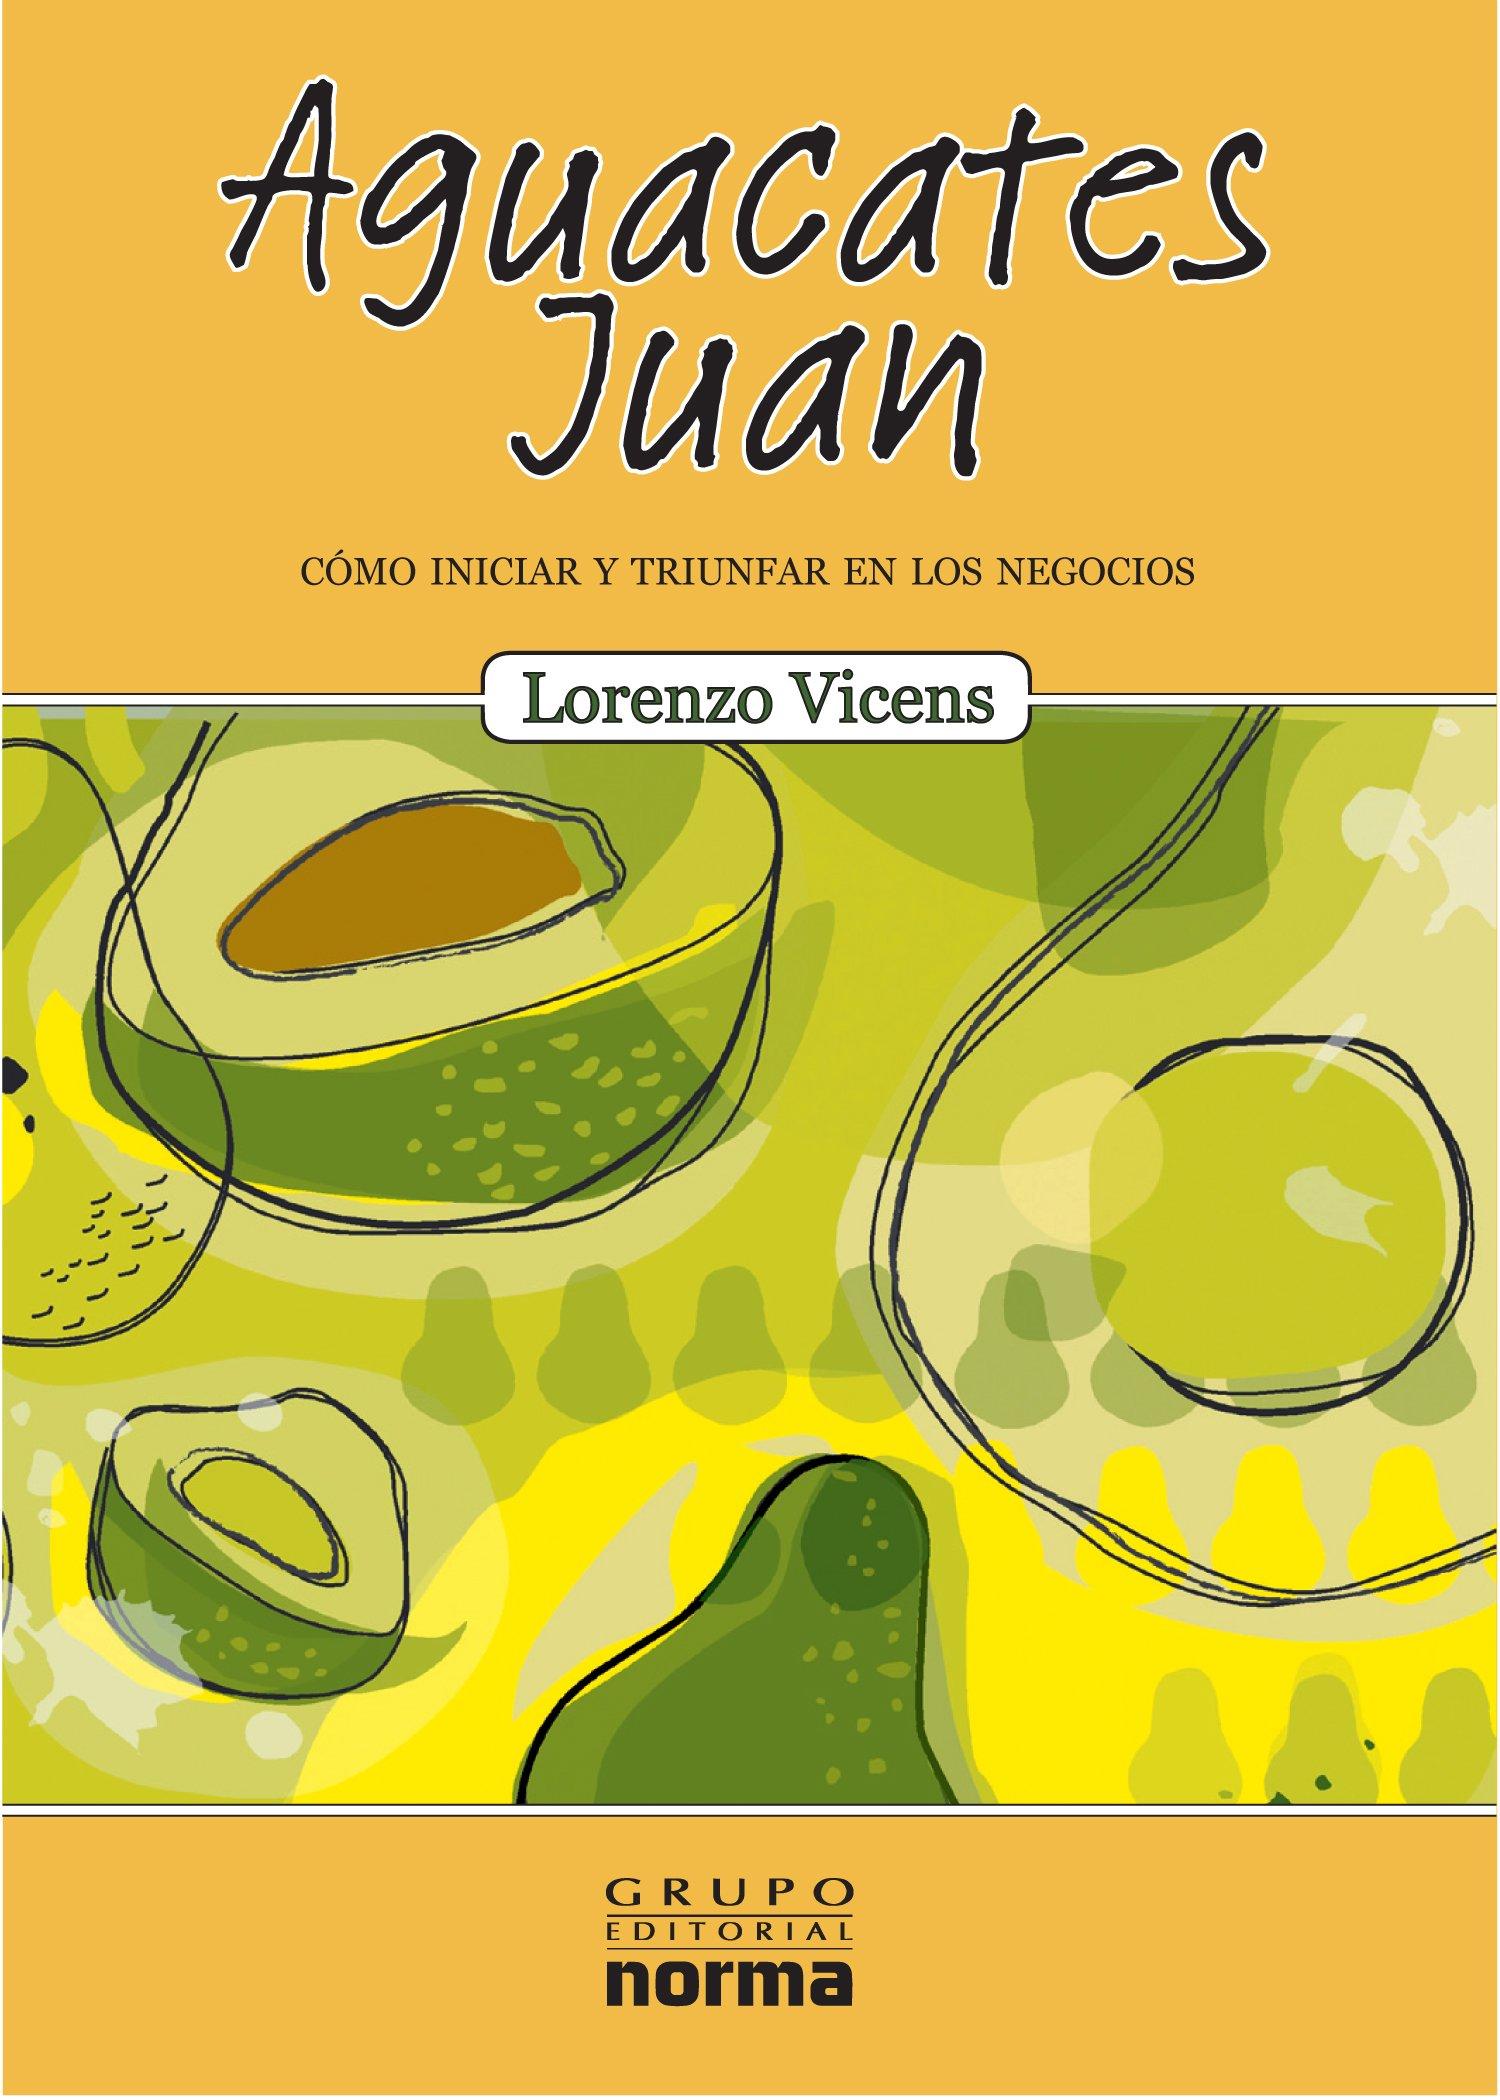 Download Aguacates Juan (Spanish Edition) ebook